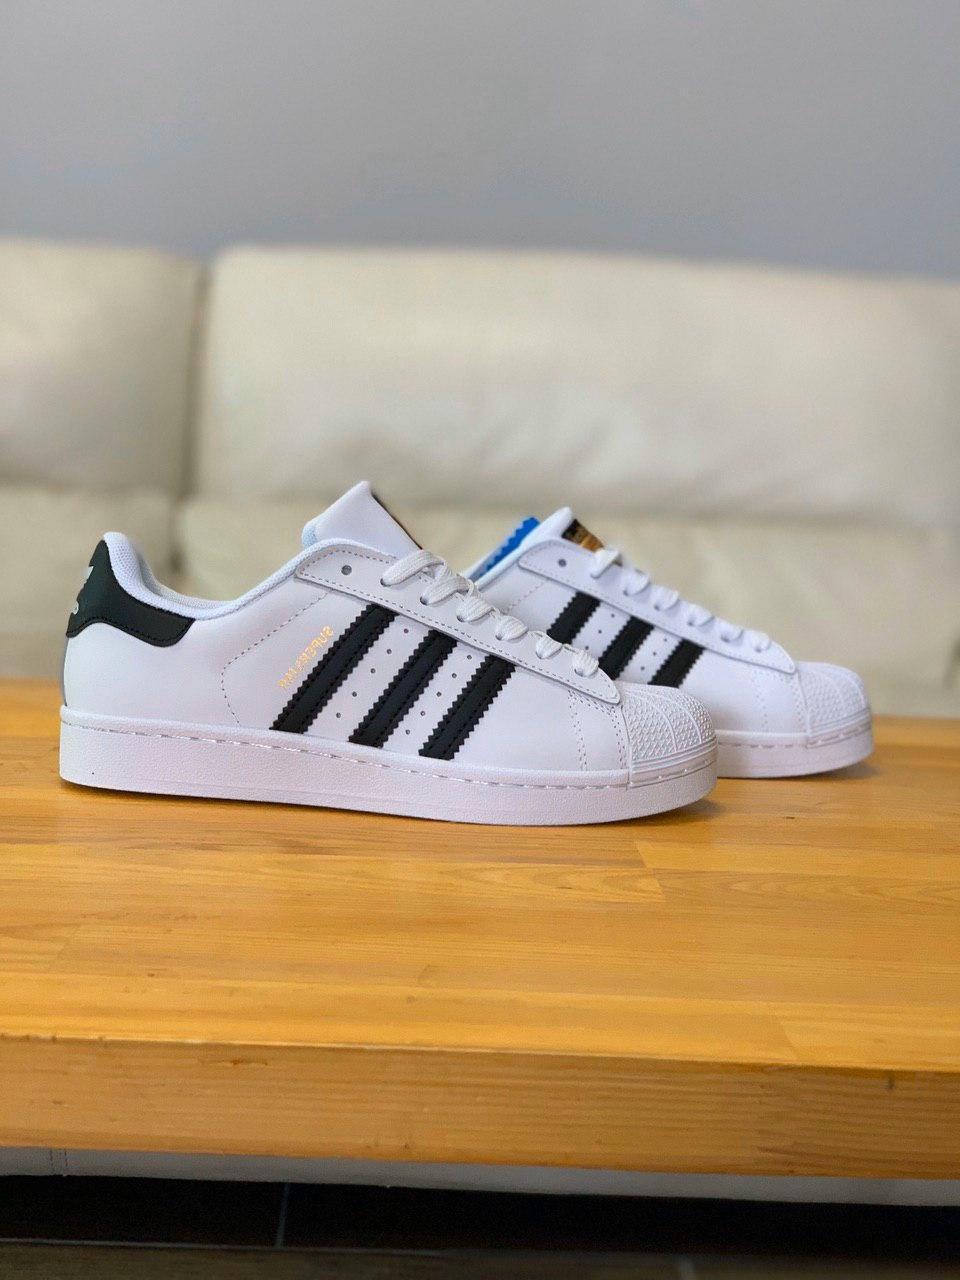 Кроссовки женские Adidas Superstar Адидас Адідас Суперстар